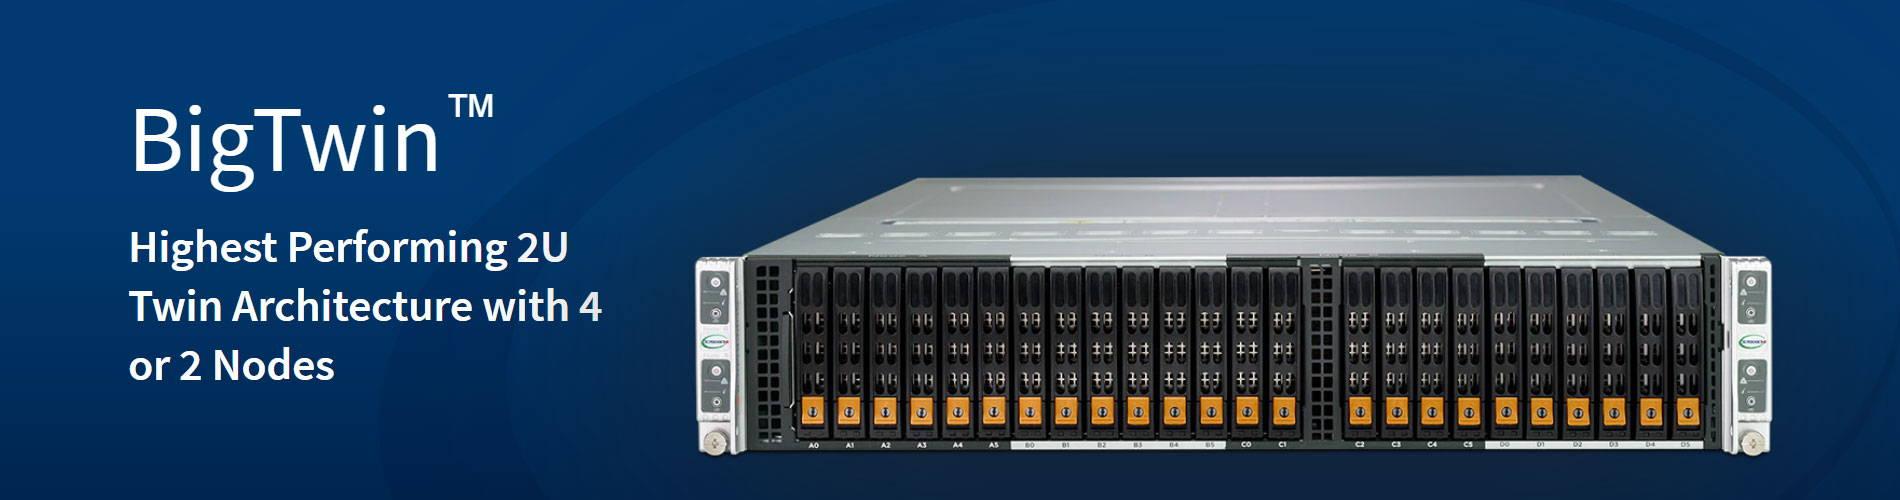 BigTwin Servers